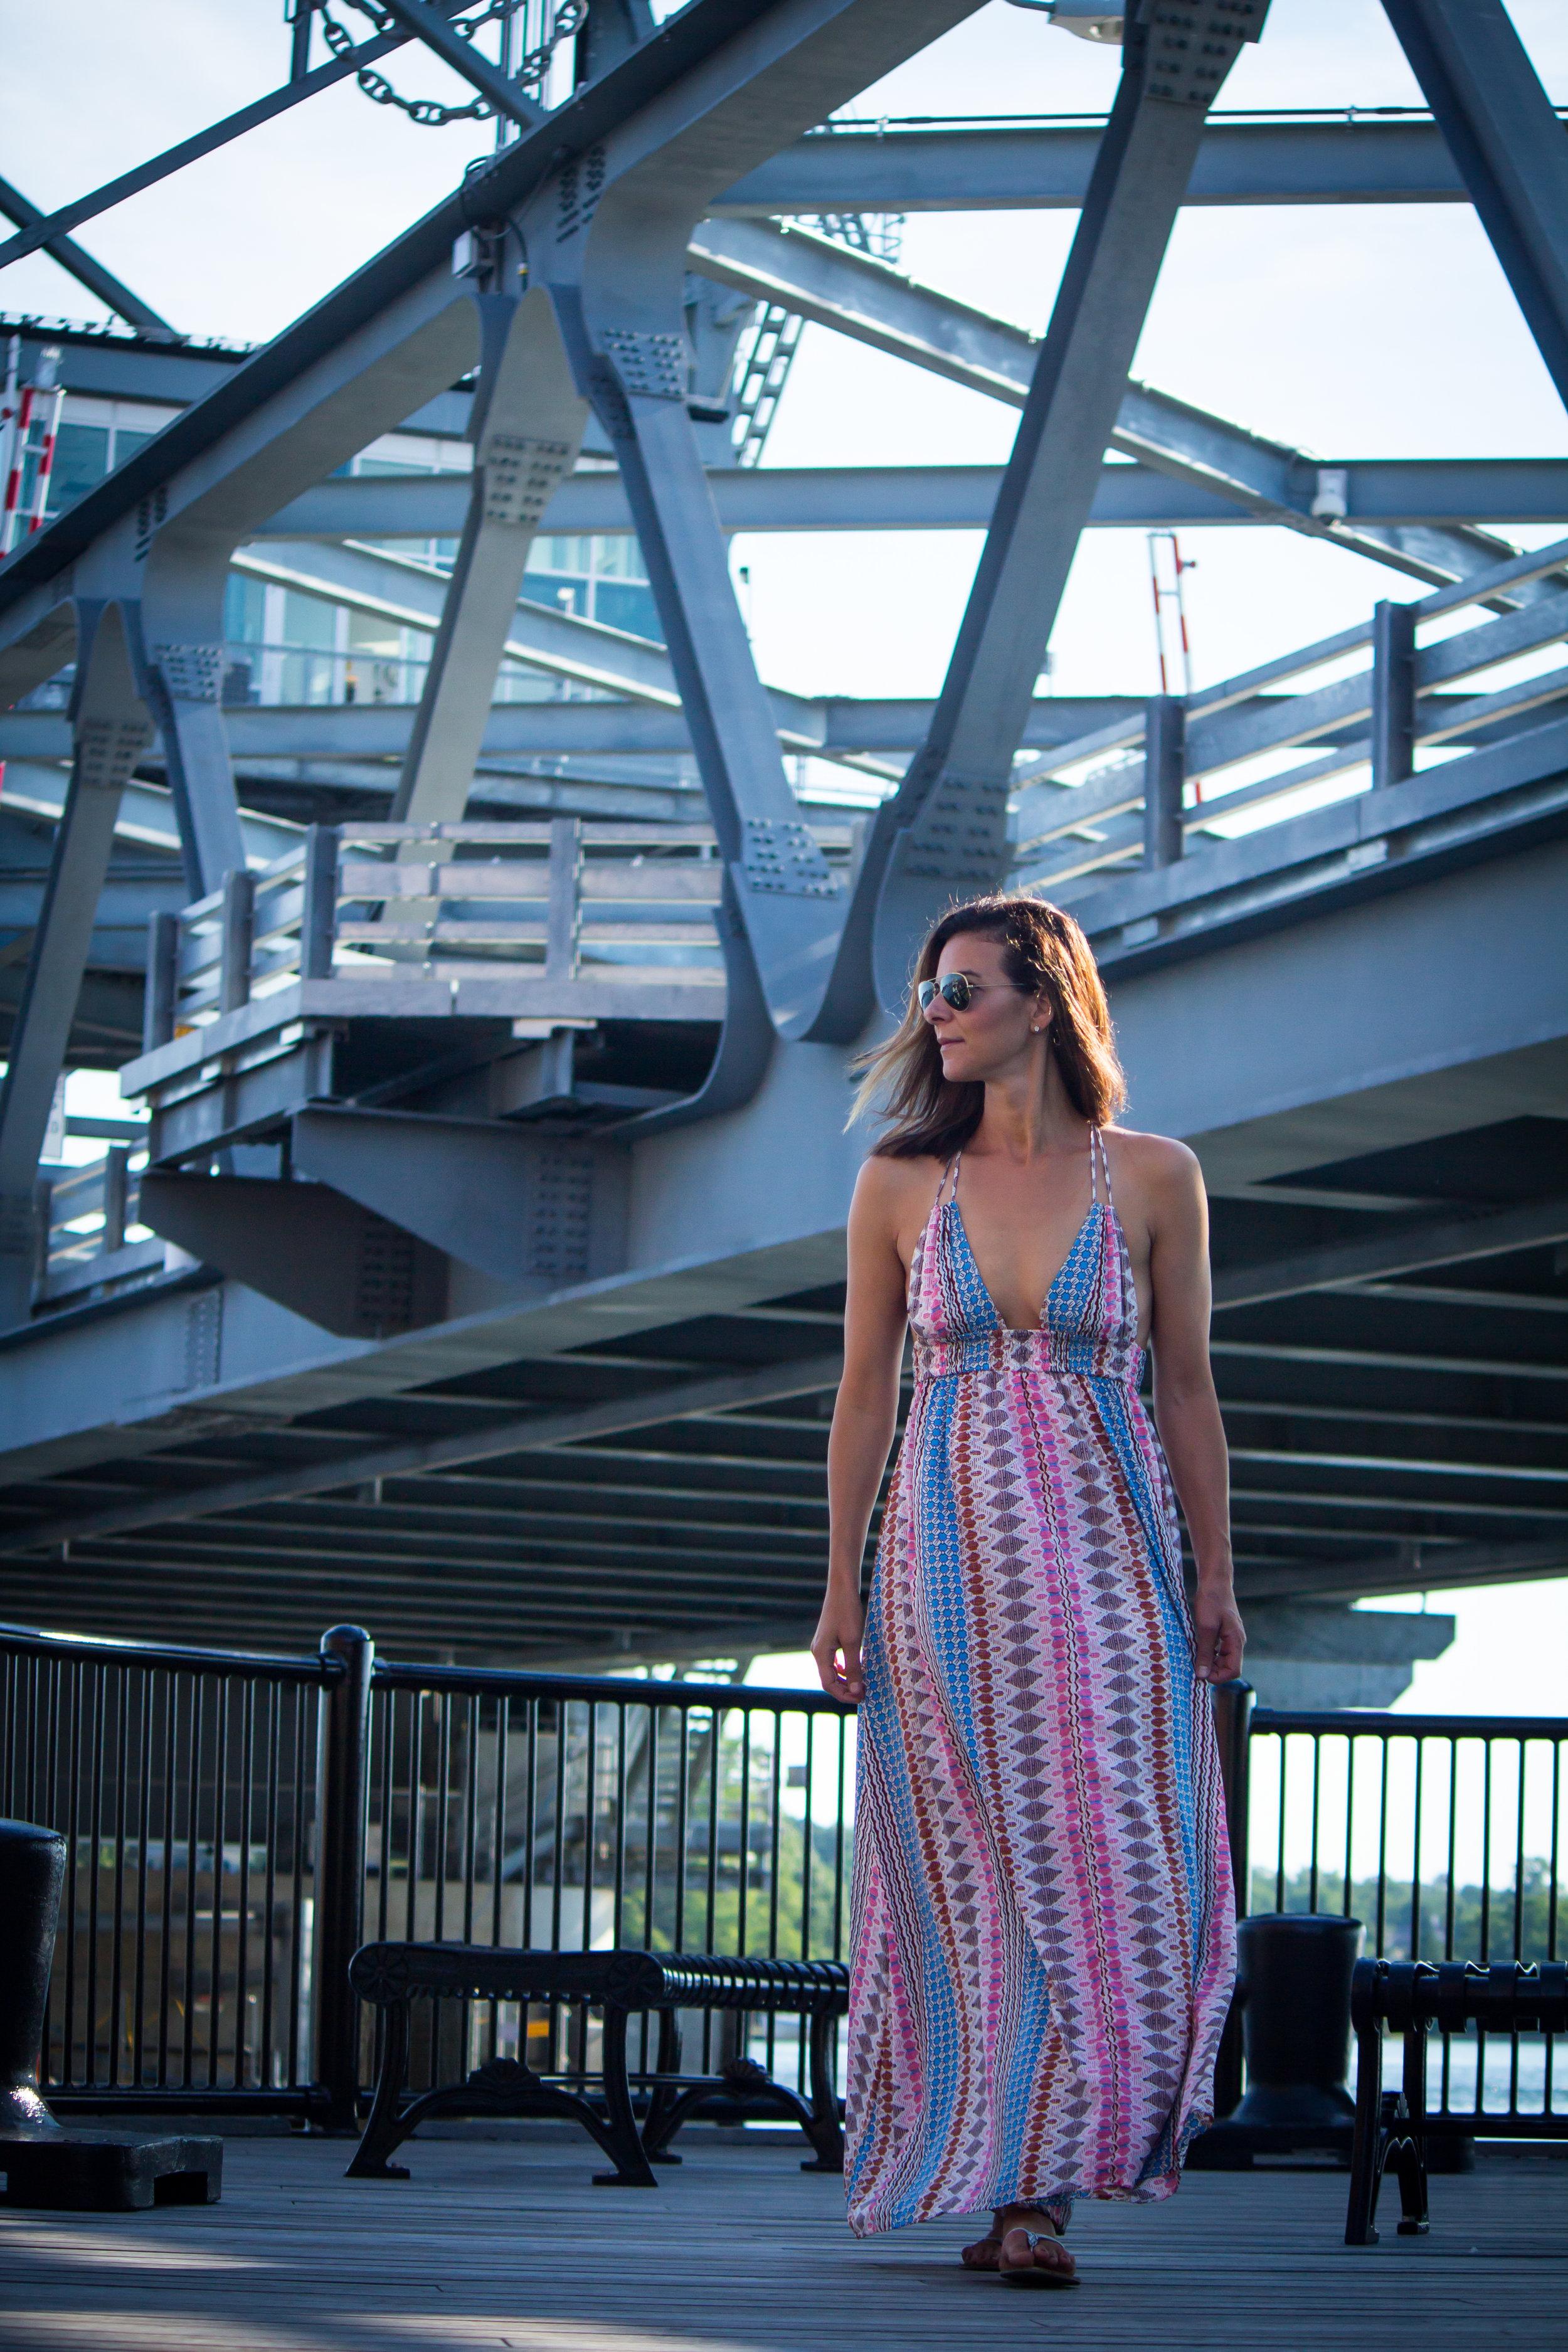 Printed Maxi Dress - Lulus Maxi Dress - Maxi Dress Outfits - Summer Maxi Dresses - Multi-colored Maxi Dresses - Summer Dress Outfits #heartandseam #lulus  www.heartandseam.com